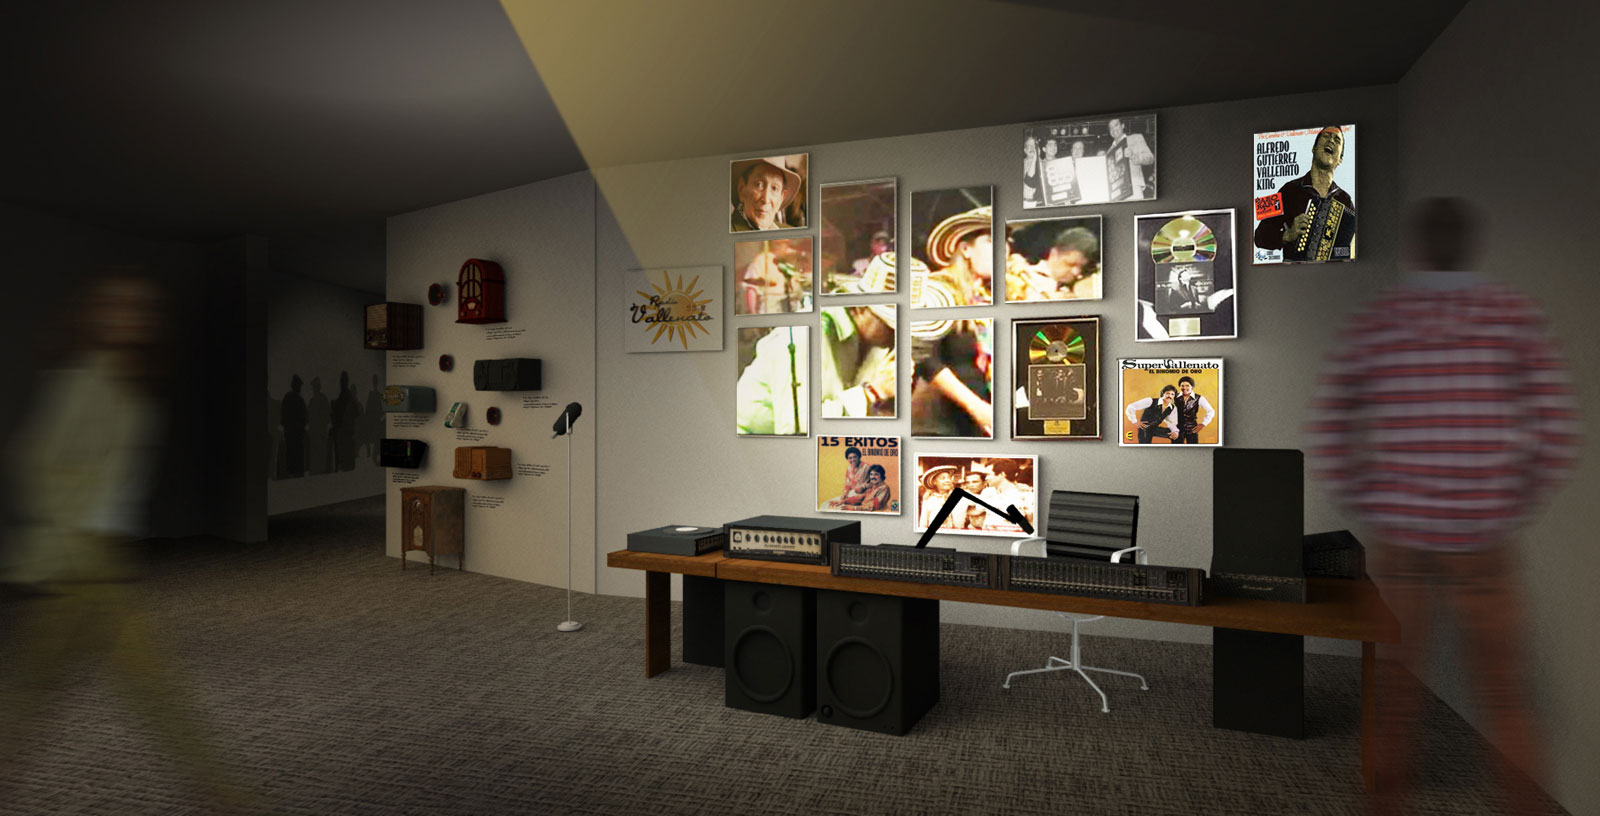 Vallenata-Music-Events-Centre_06_Architecture_Idom_computer-graphics_Manuel-Leira